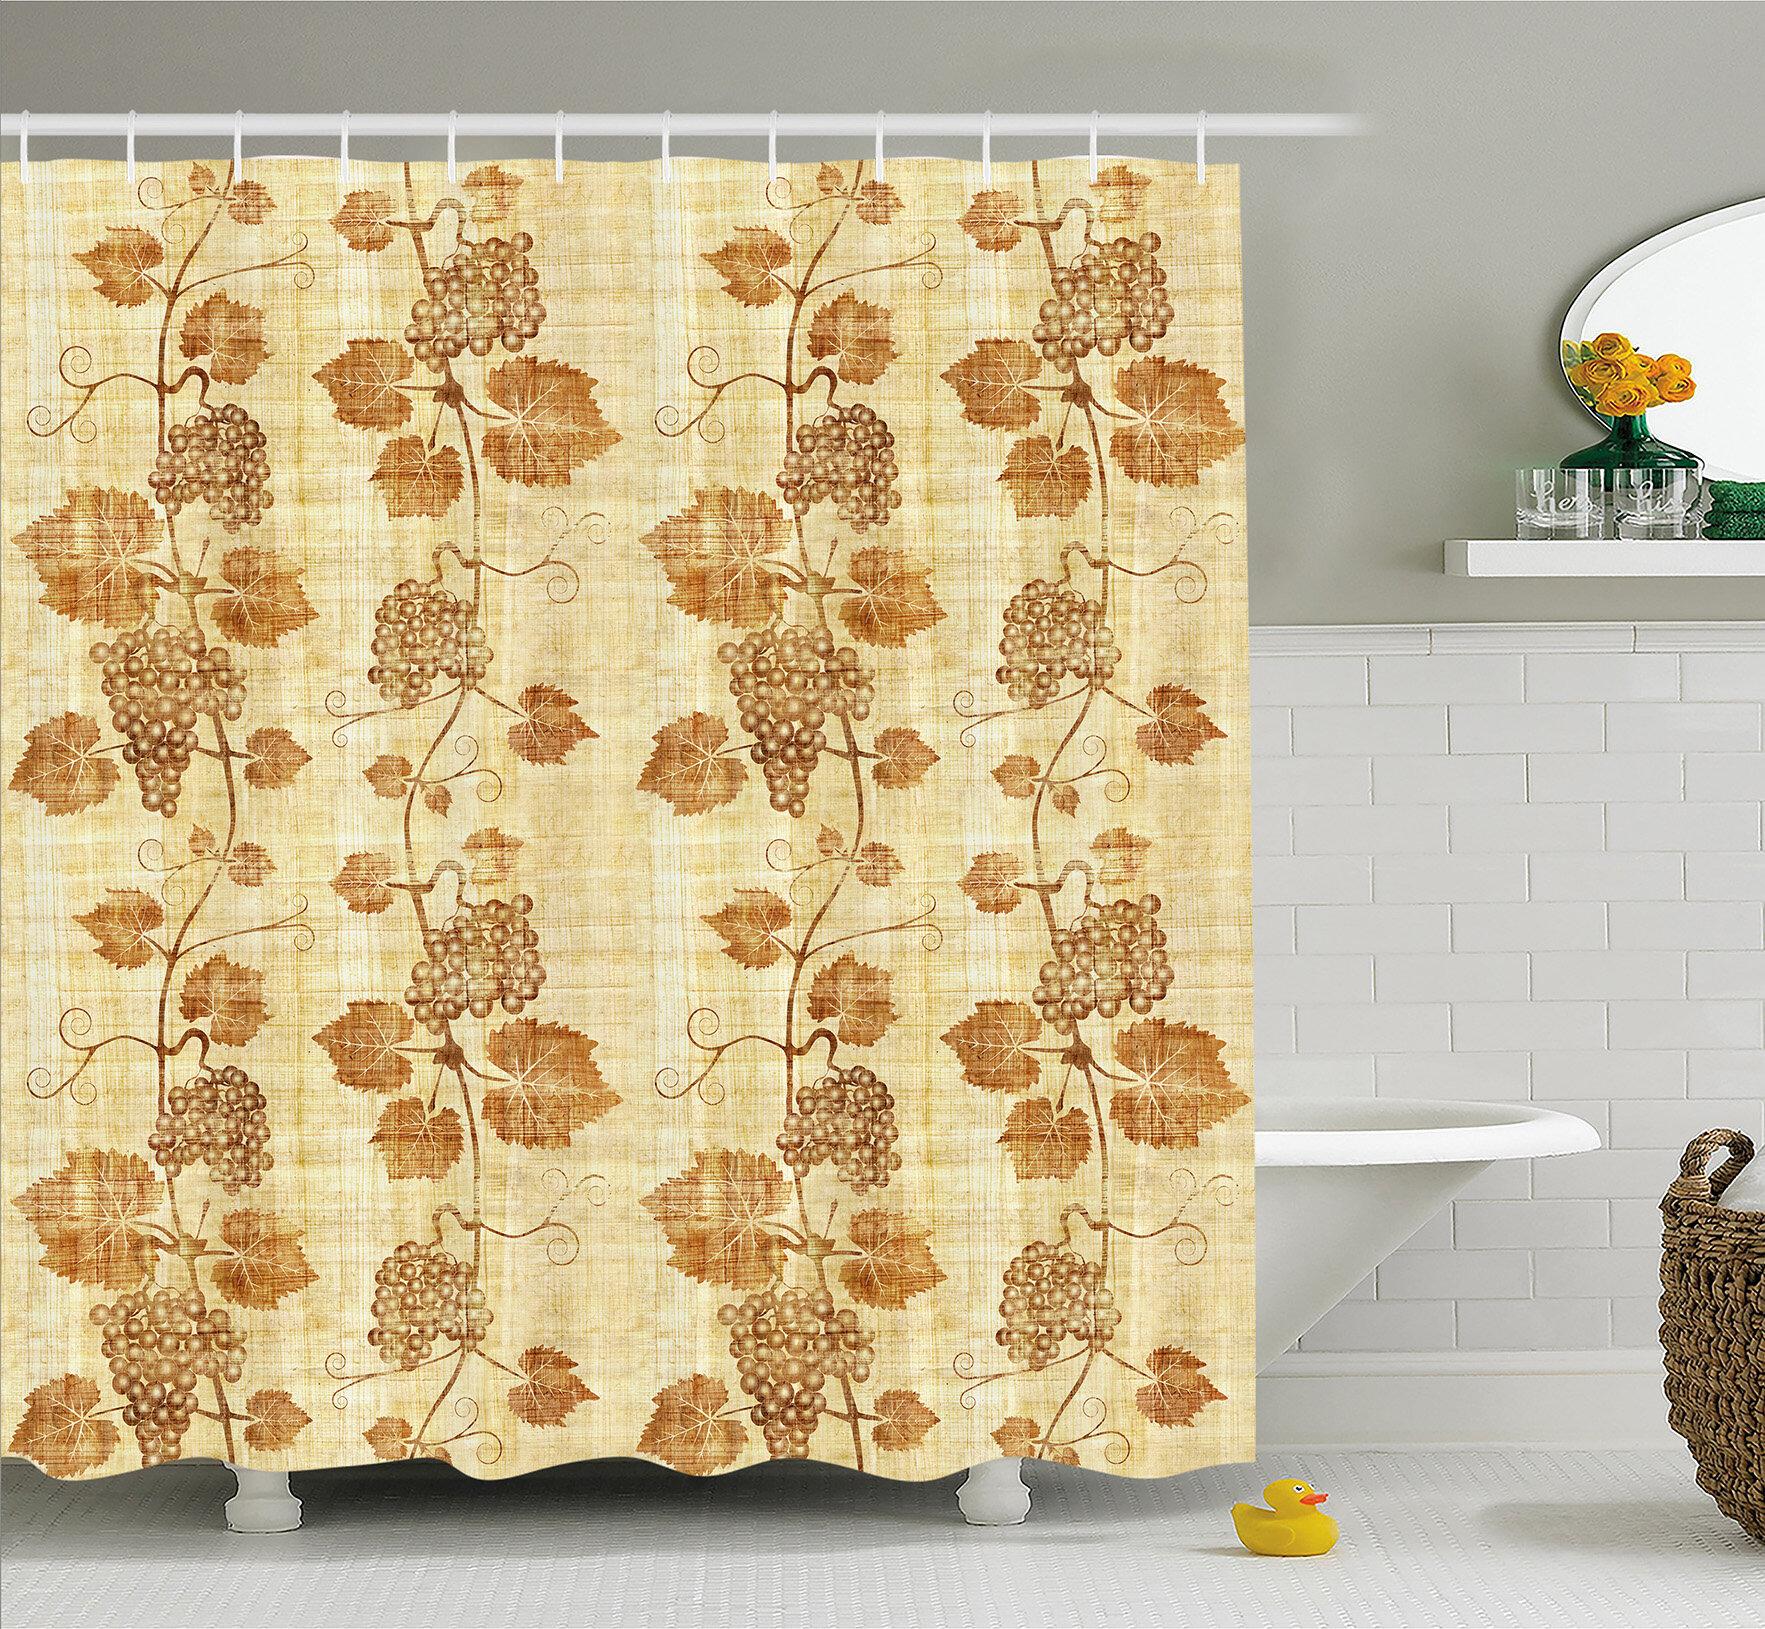 Ancient Egyptian Women Papyrus Shower Curtain Set Bathroom Mat Waterproof Fabric